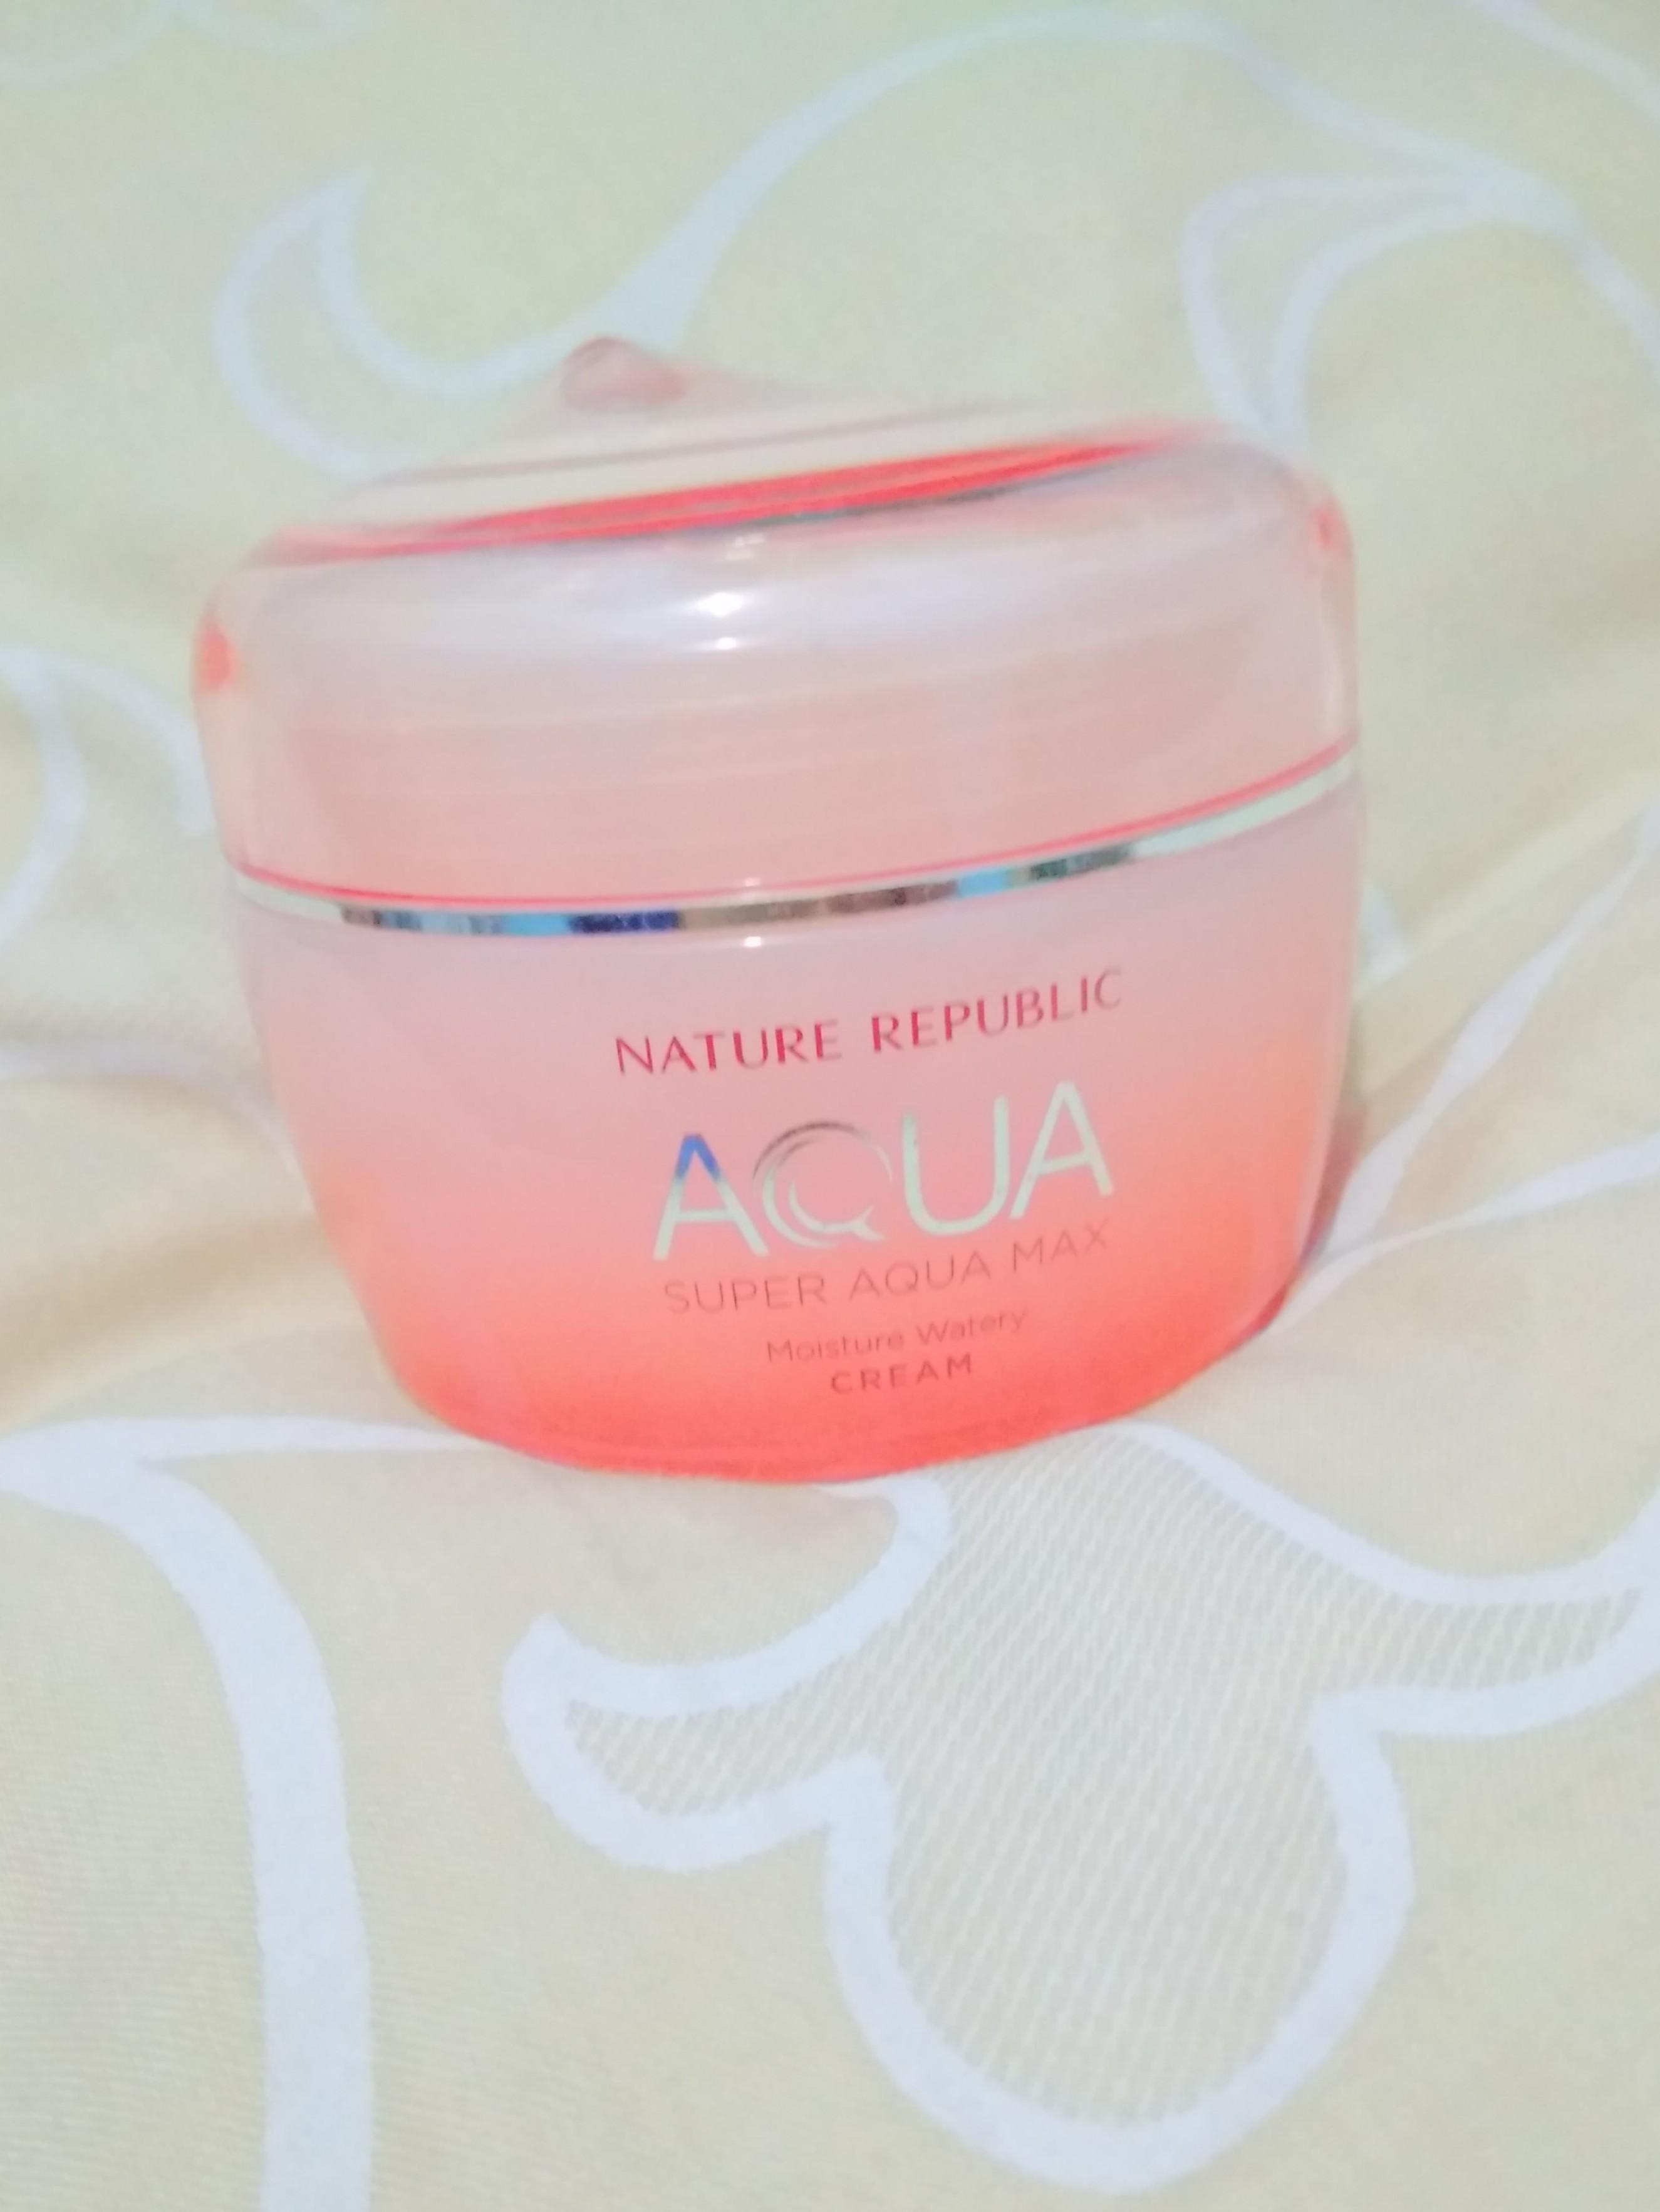 #mauovo Nature republik aqua water cream moisturizer